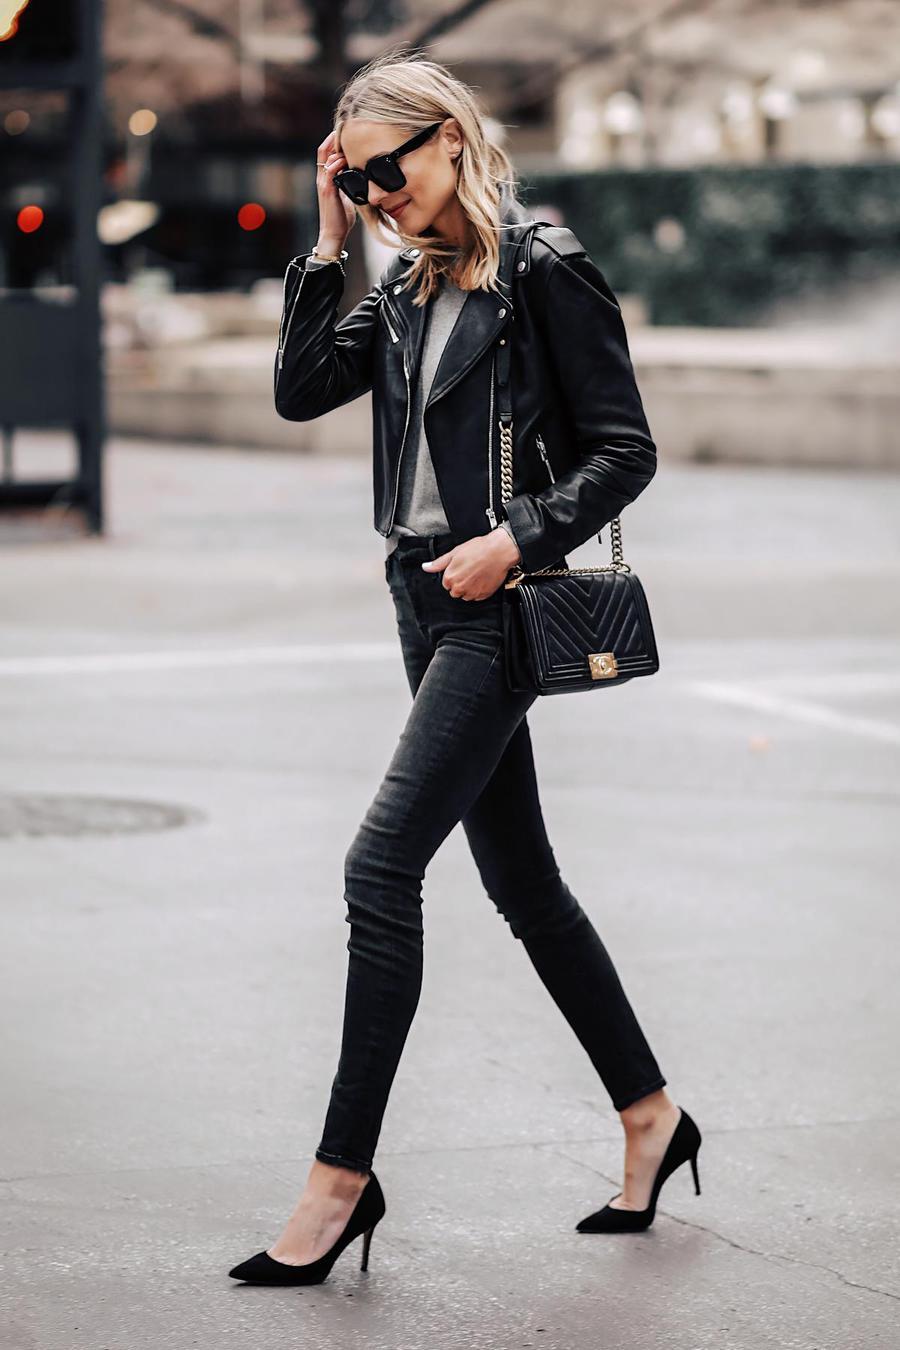 fashionjackson blogger jacket sweater jeans shoes bag sunglasses leather jacket black jeans chanel bag high heel pumps black jacket pumps black skinny jeans high waisted jeans black bag black sunglasses